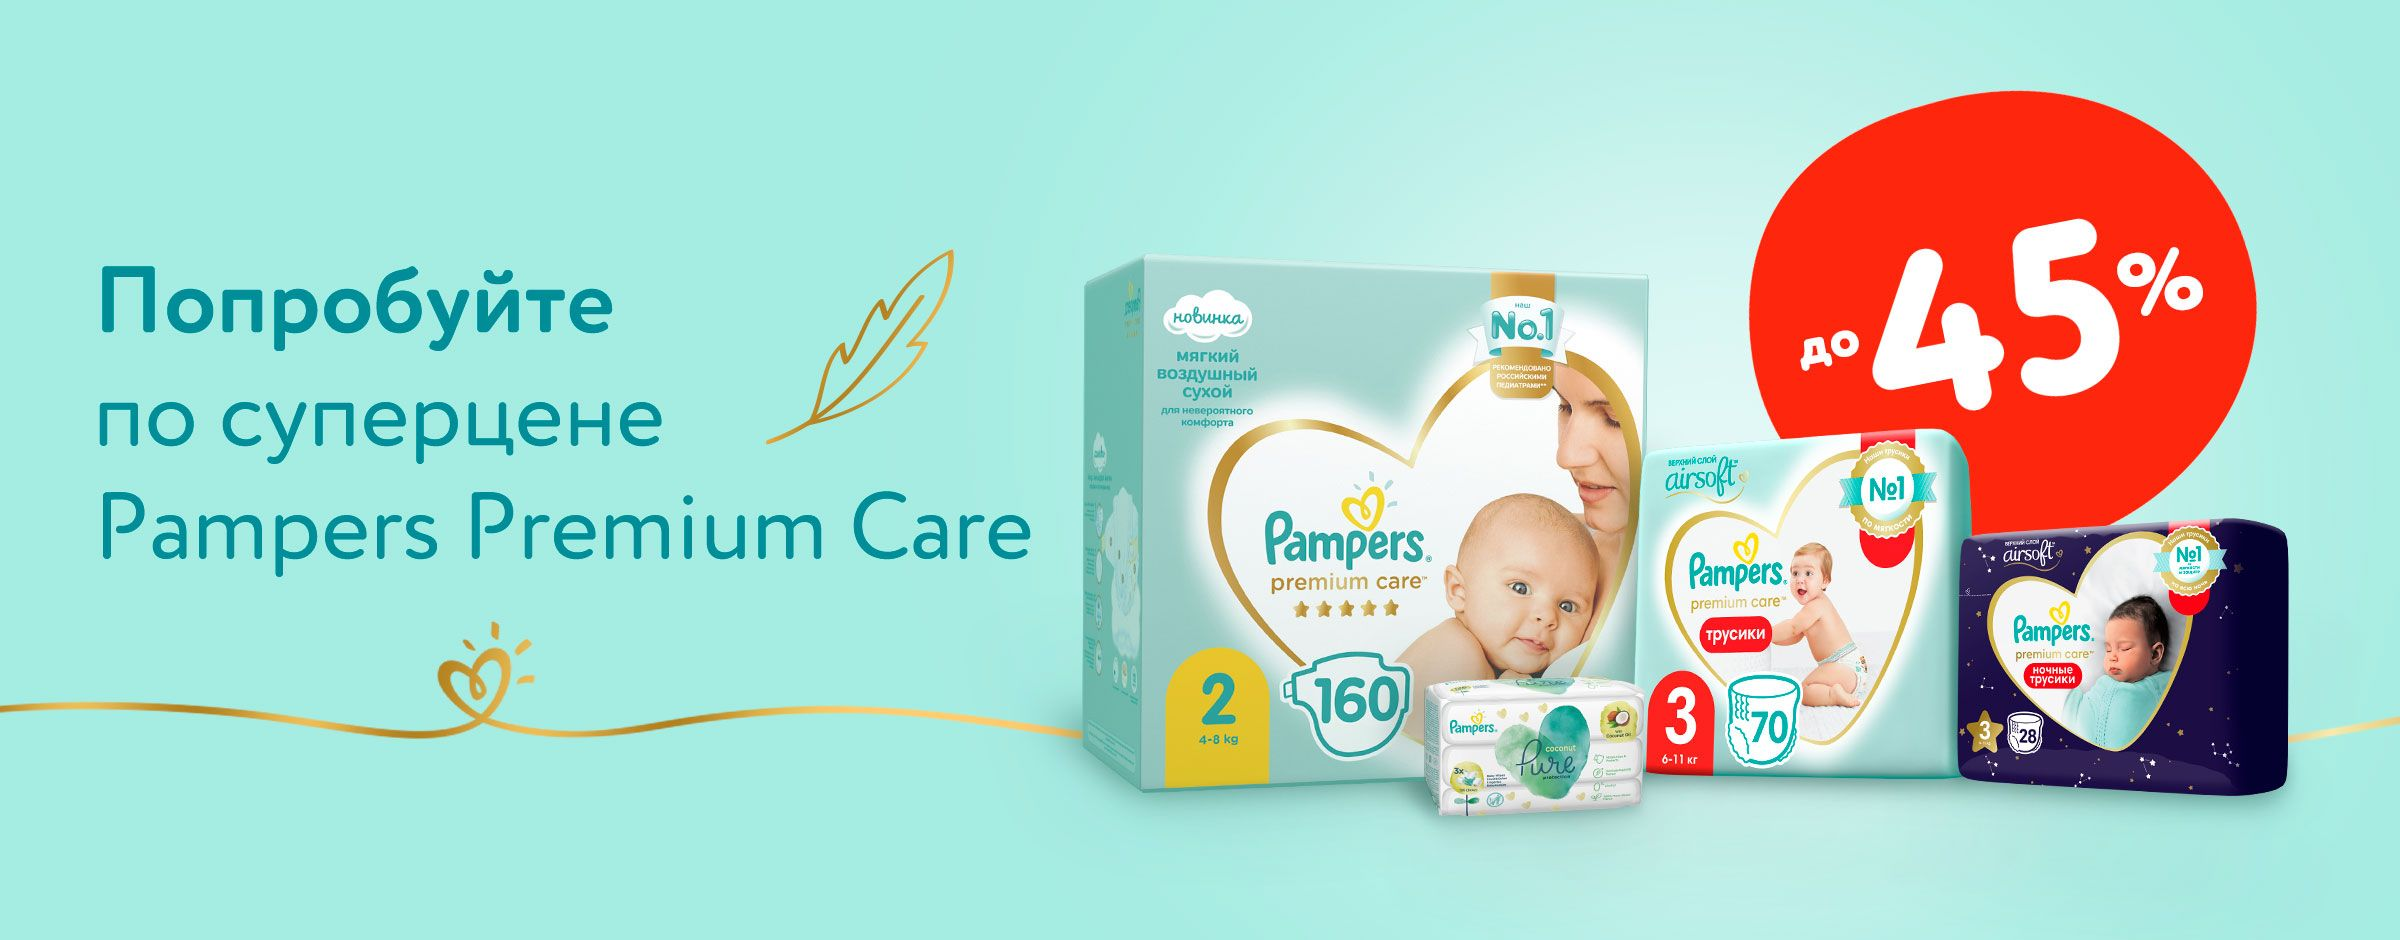 Pampers Premium Care статика 3